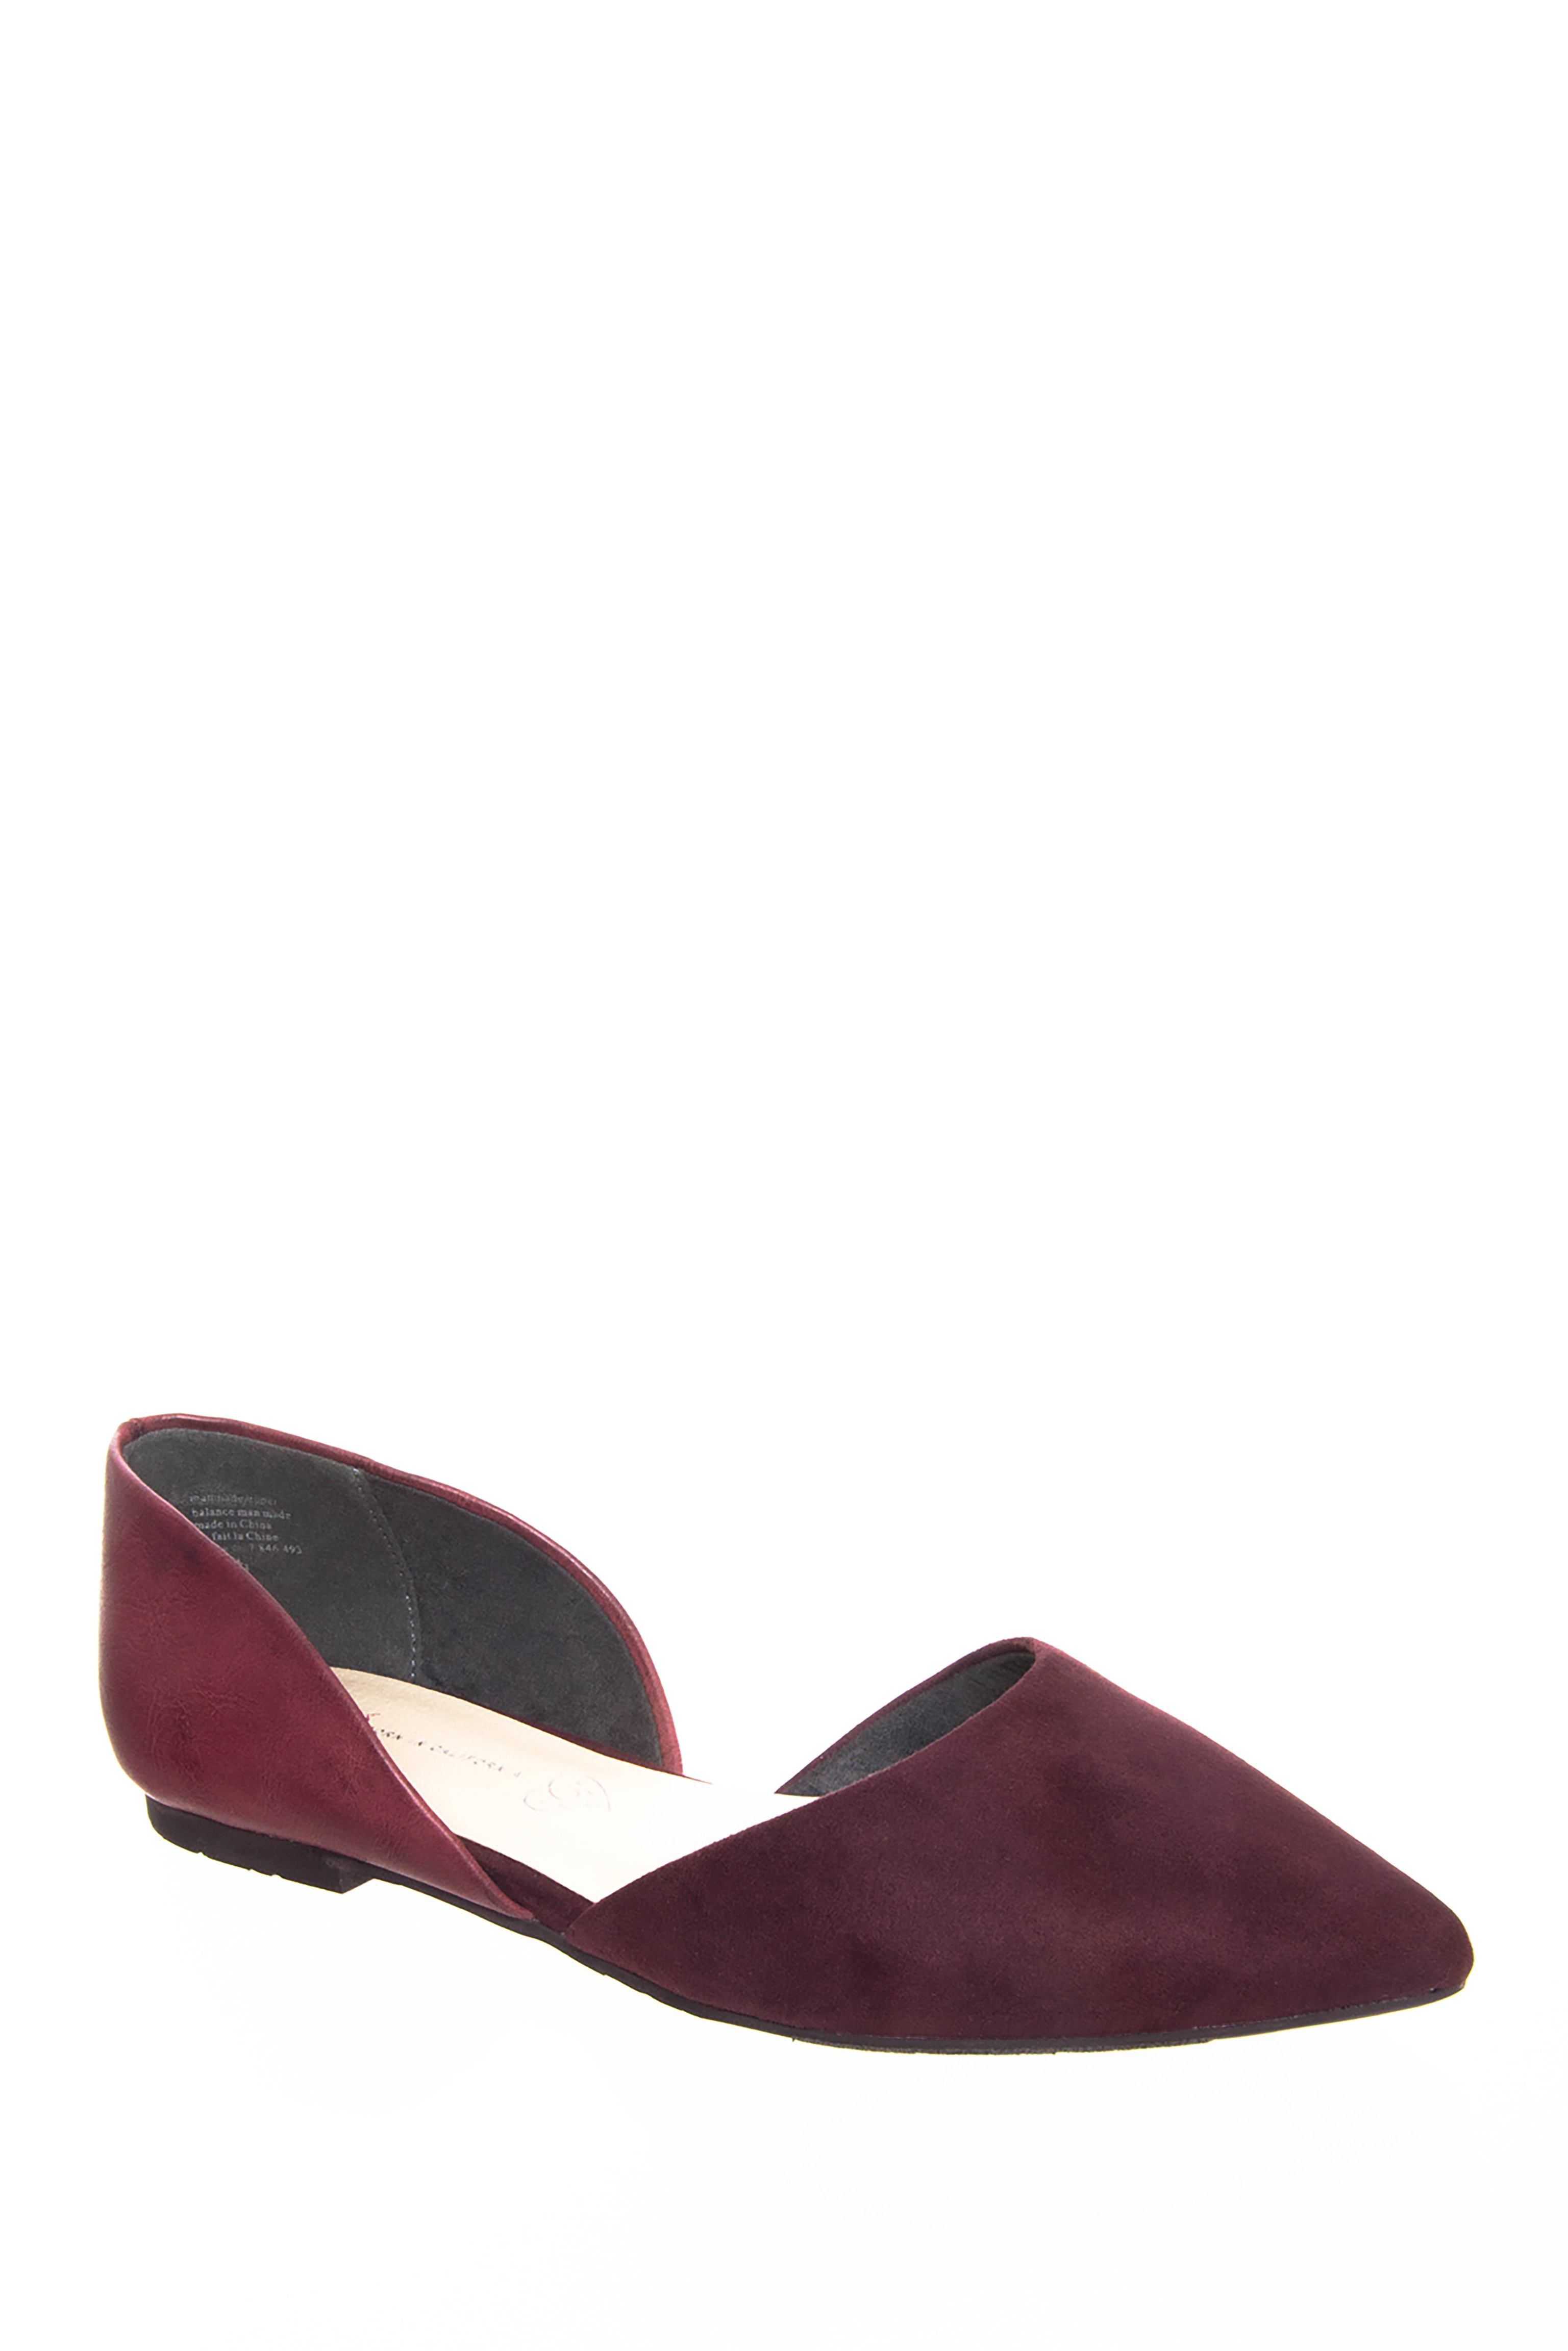 BC Footwear Society d'Orsay Flats - Burgundy